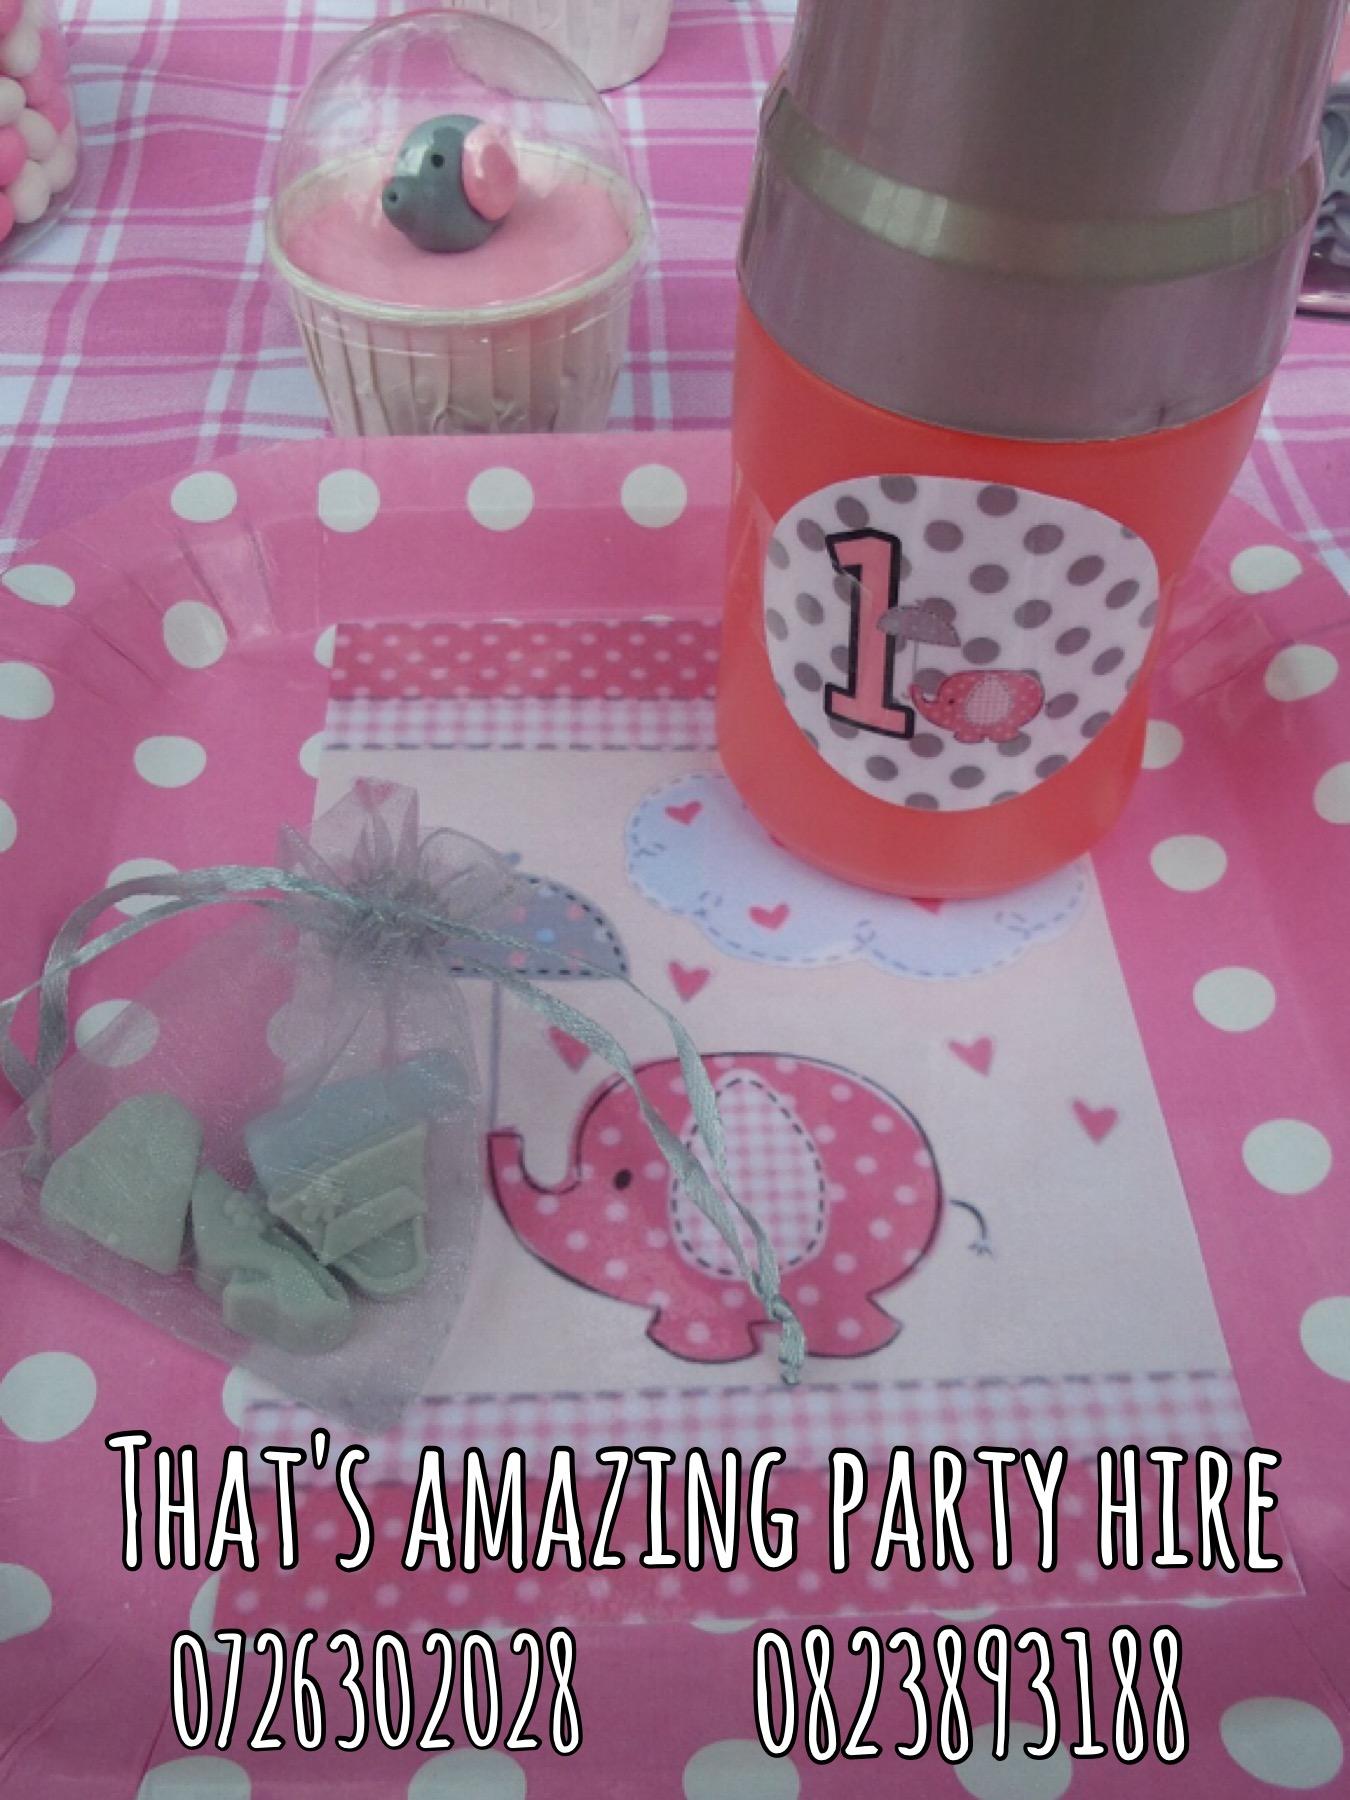 Elephant Party setup